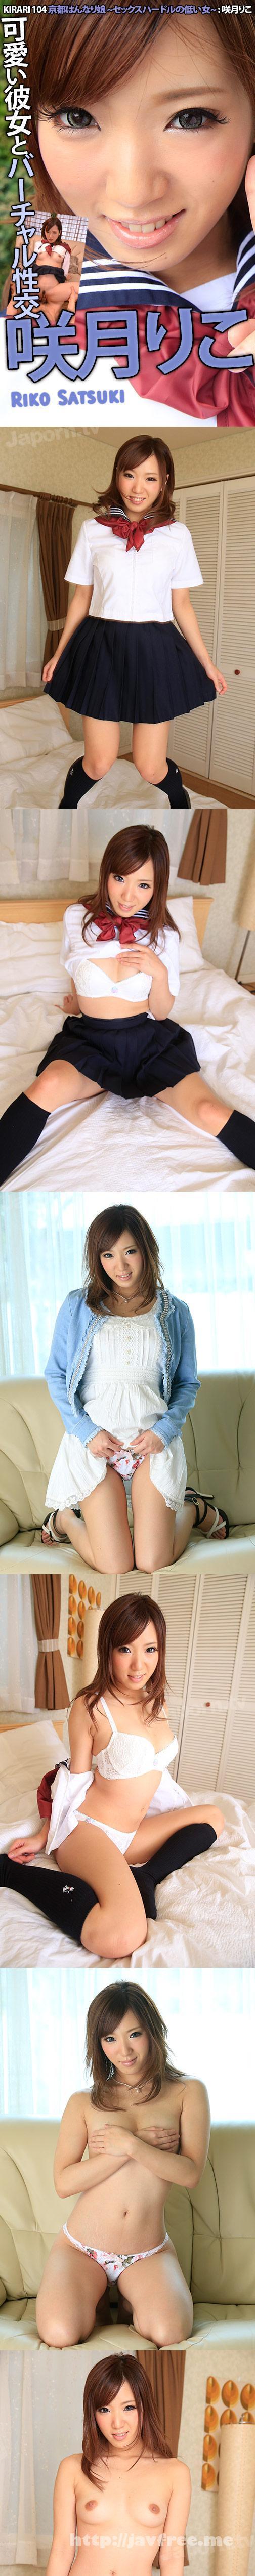 [MKD-S104] KIRARI 104 京都はんなり娘 ~セックスハードルの低い女~ : 咲月りこ - image MKD-S104_1 on https://javfree.me